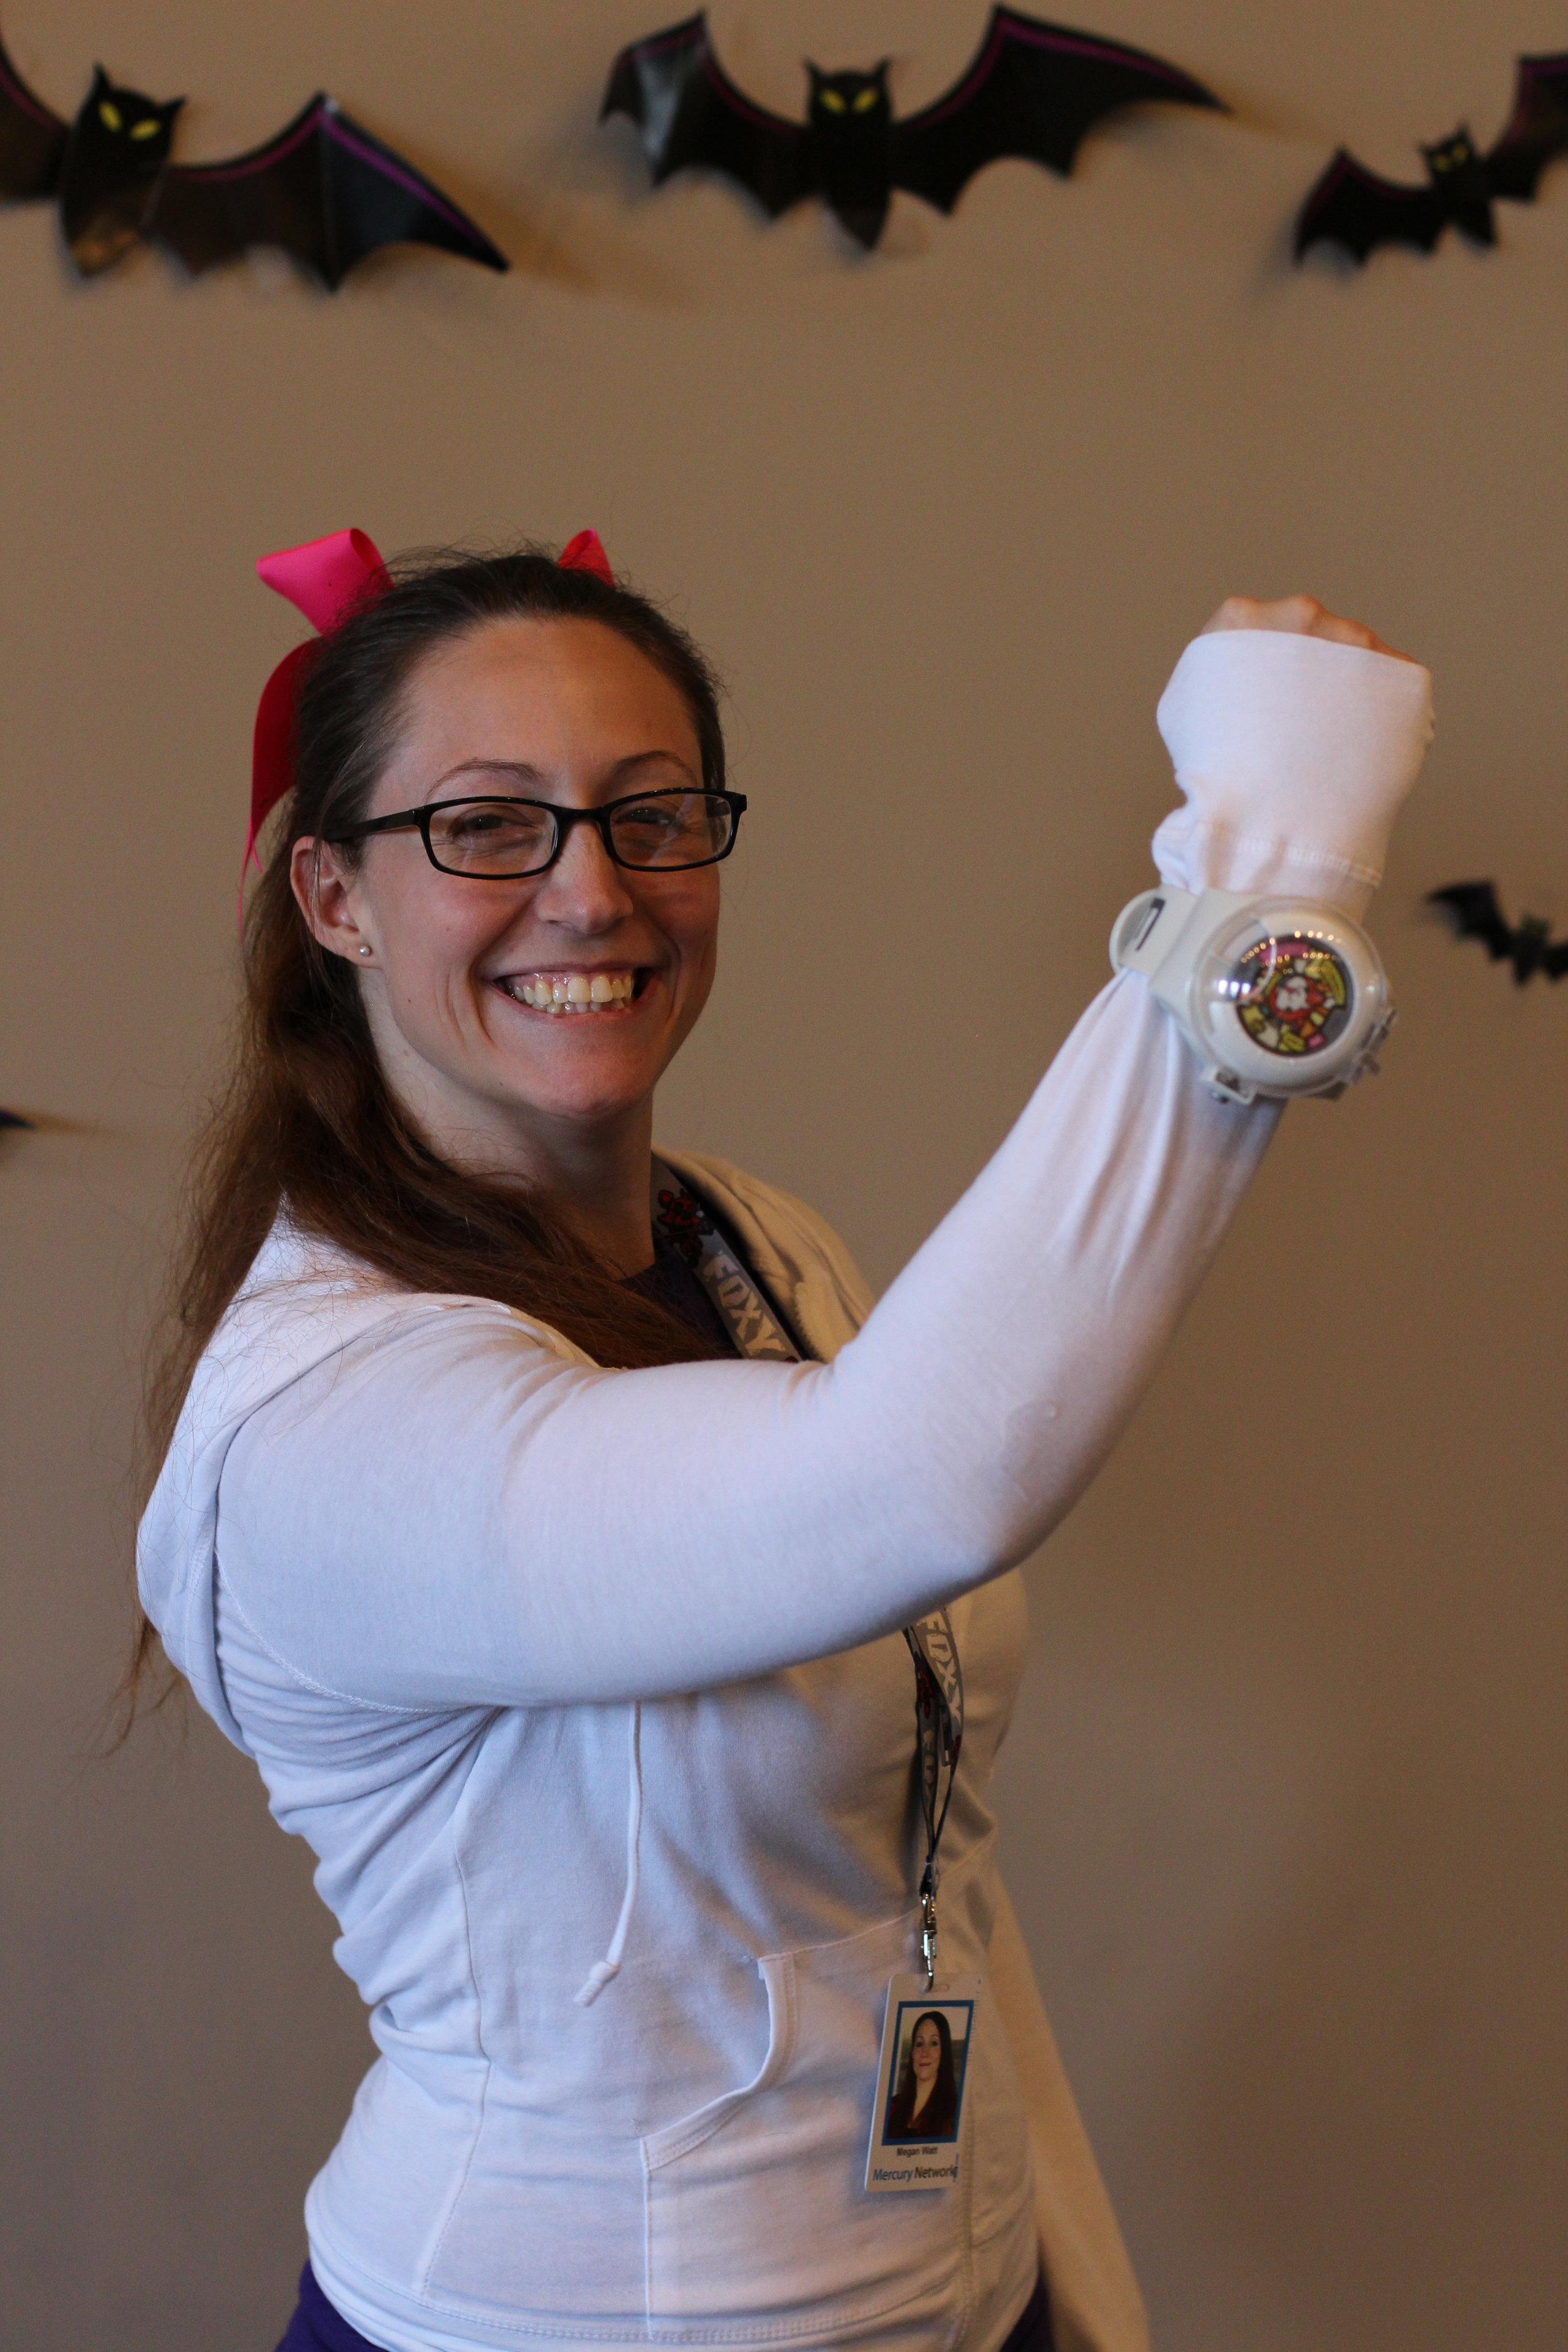 Megan Watt - Katie from Yo Kai Watch